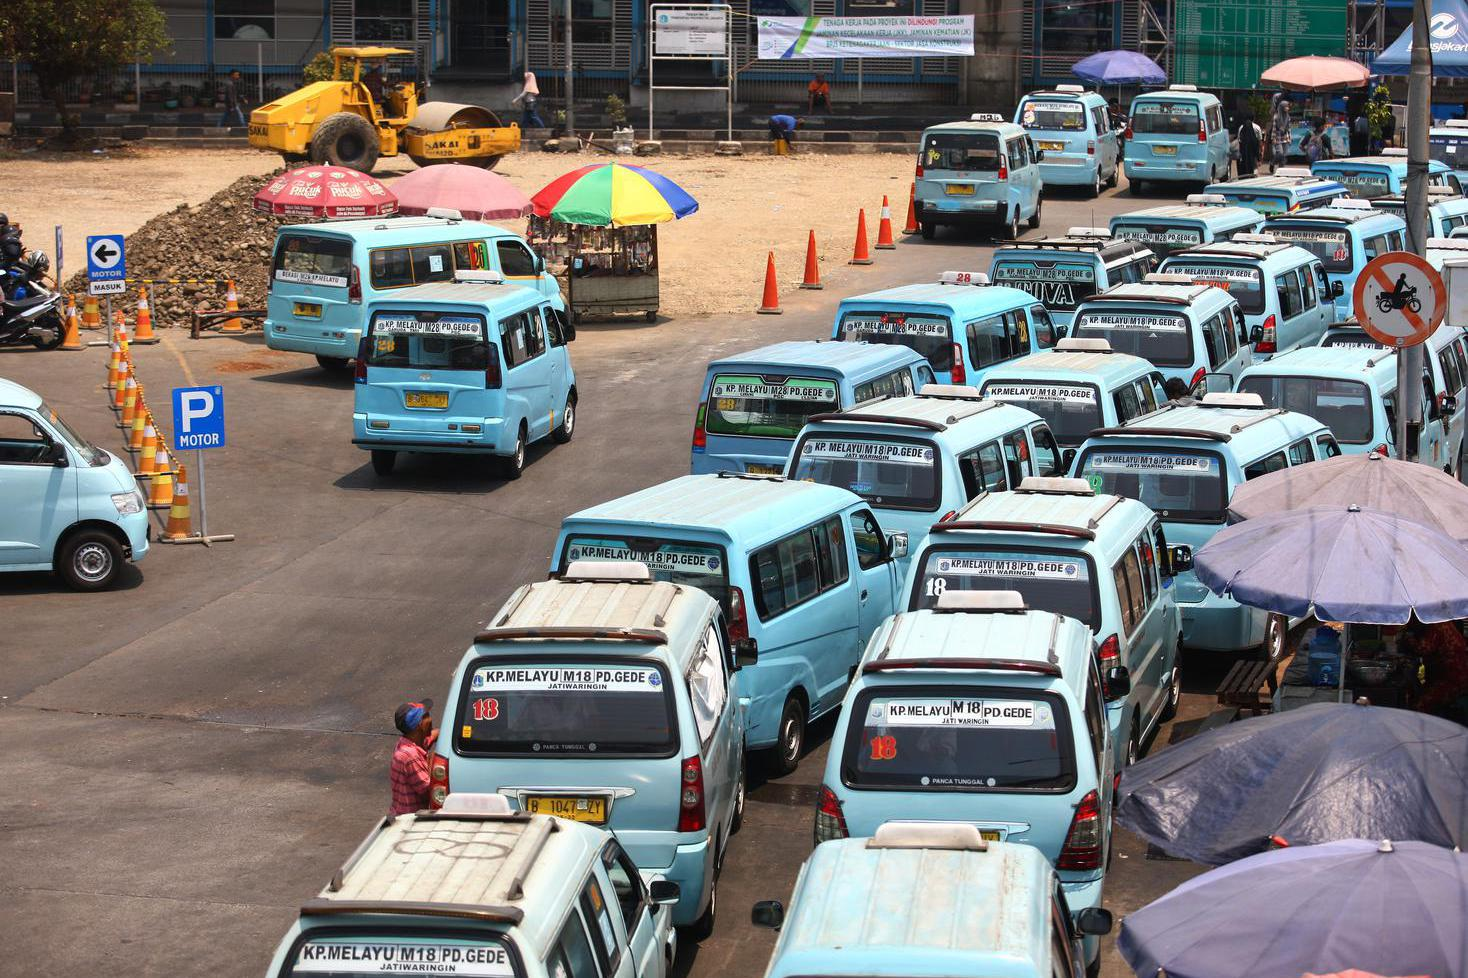 Hitung Dampak Corona, Jokowi: Sopir Angkot dan Ojek Paling Terdampak